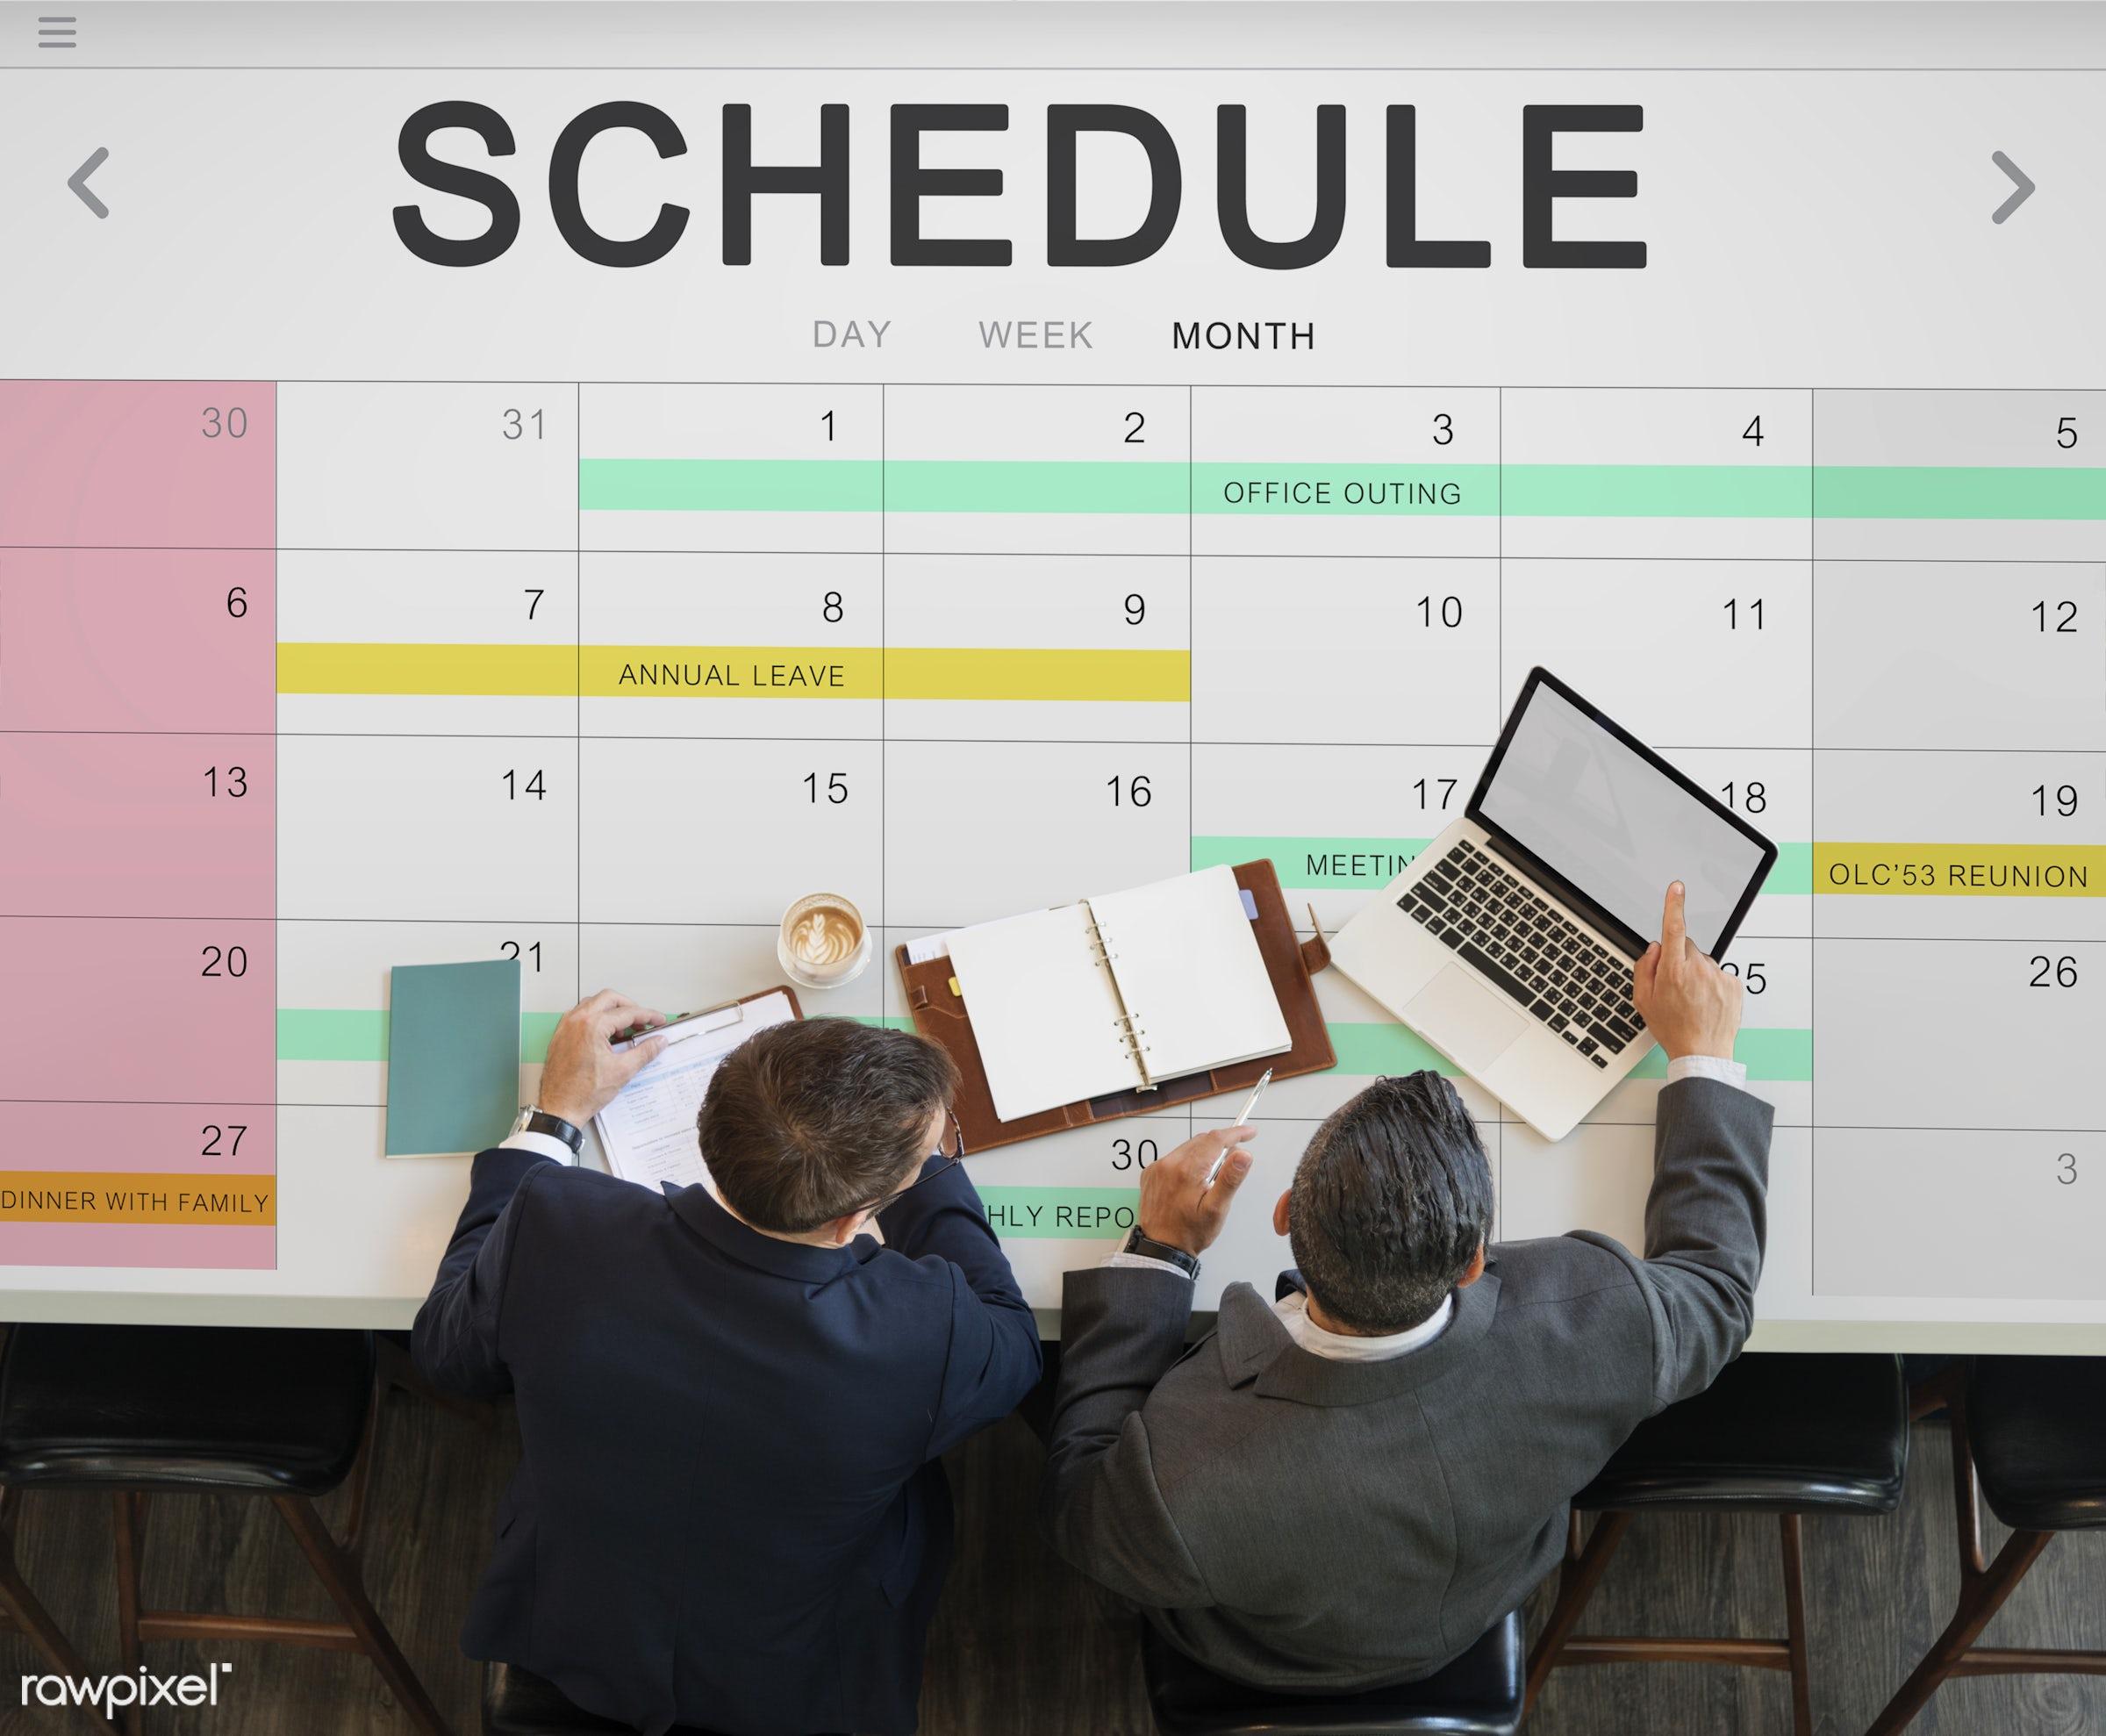 appointment, business, businessman, businessmen, businessperson, calculator, calendar, checklist, concept, daily report,...